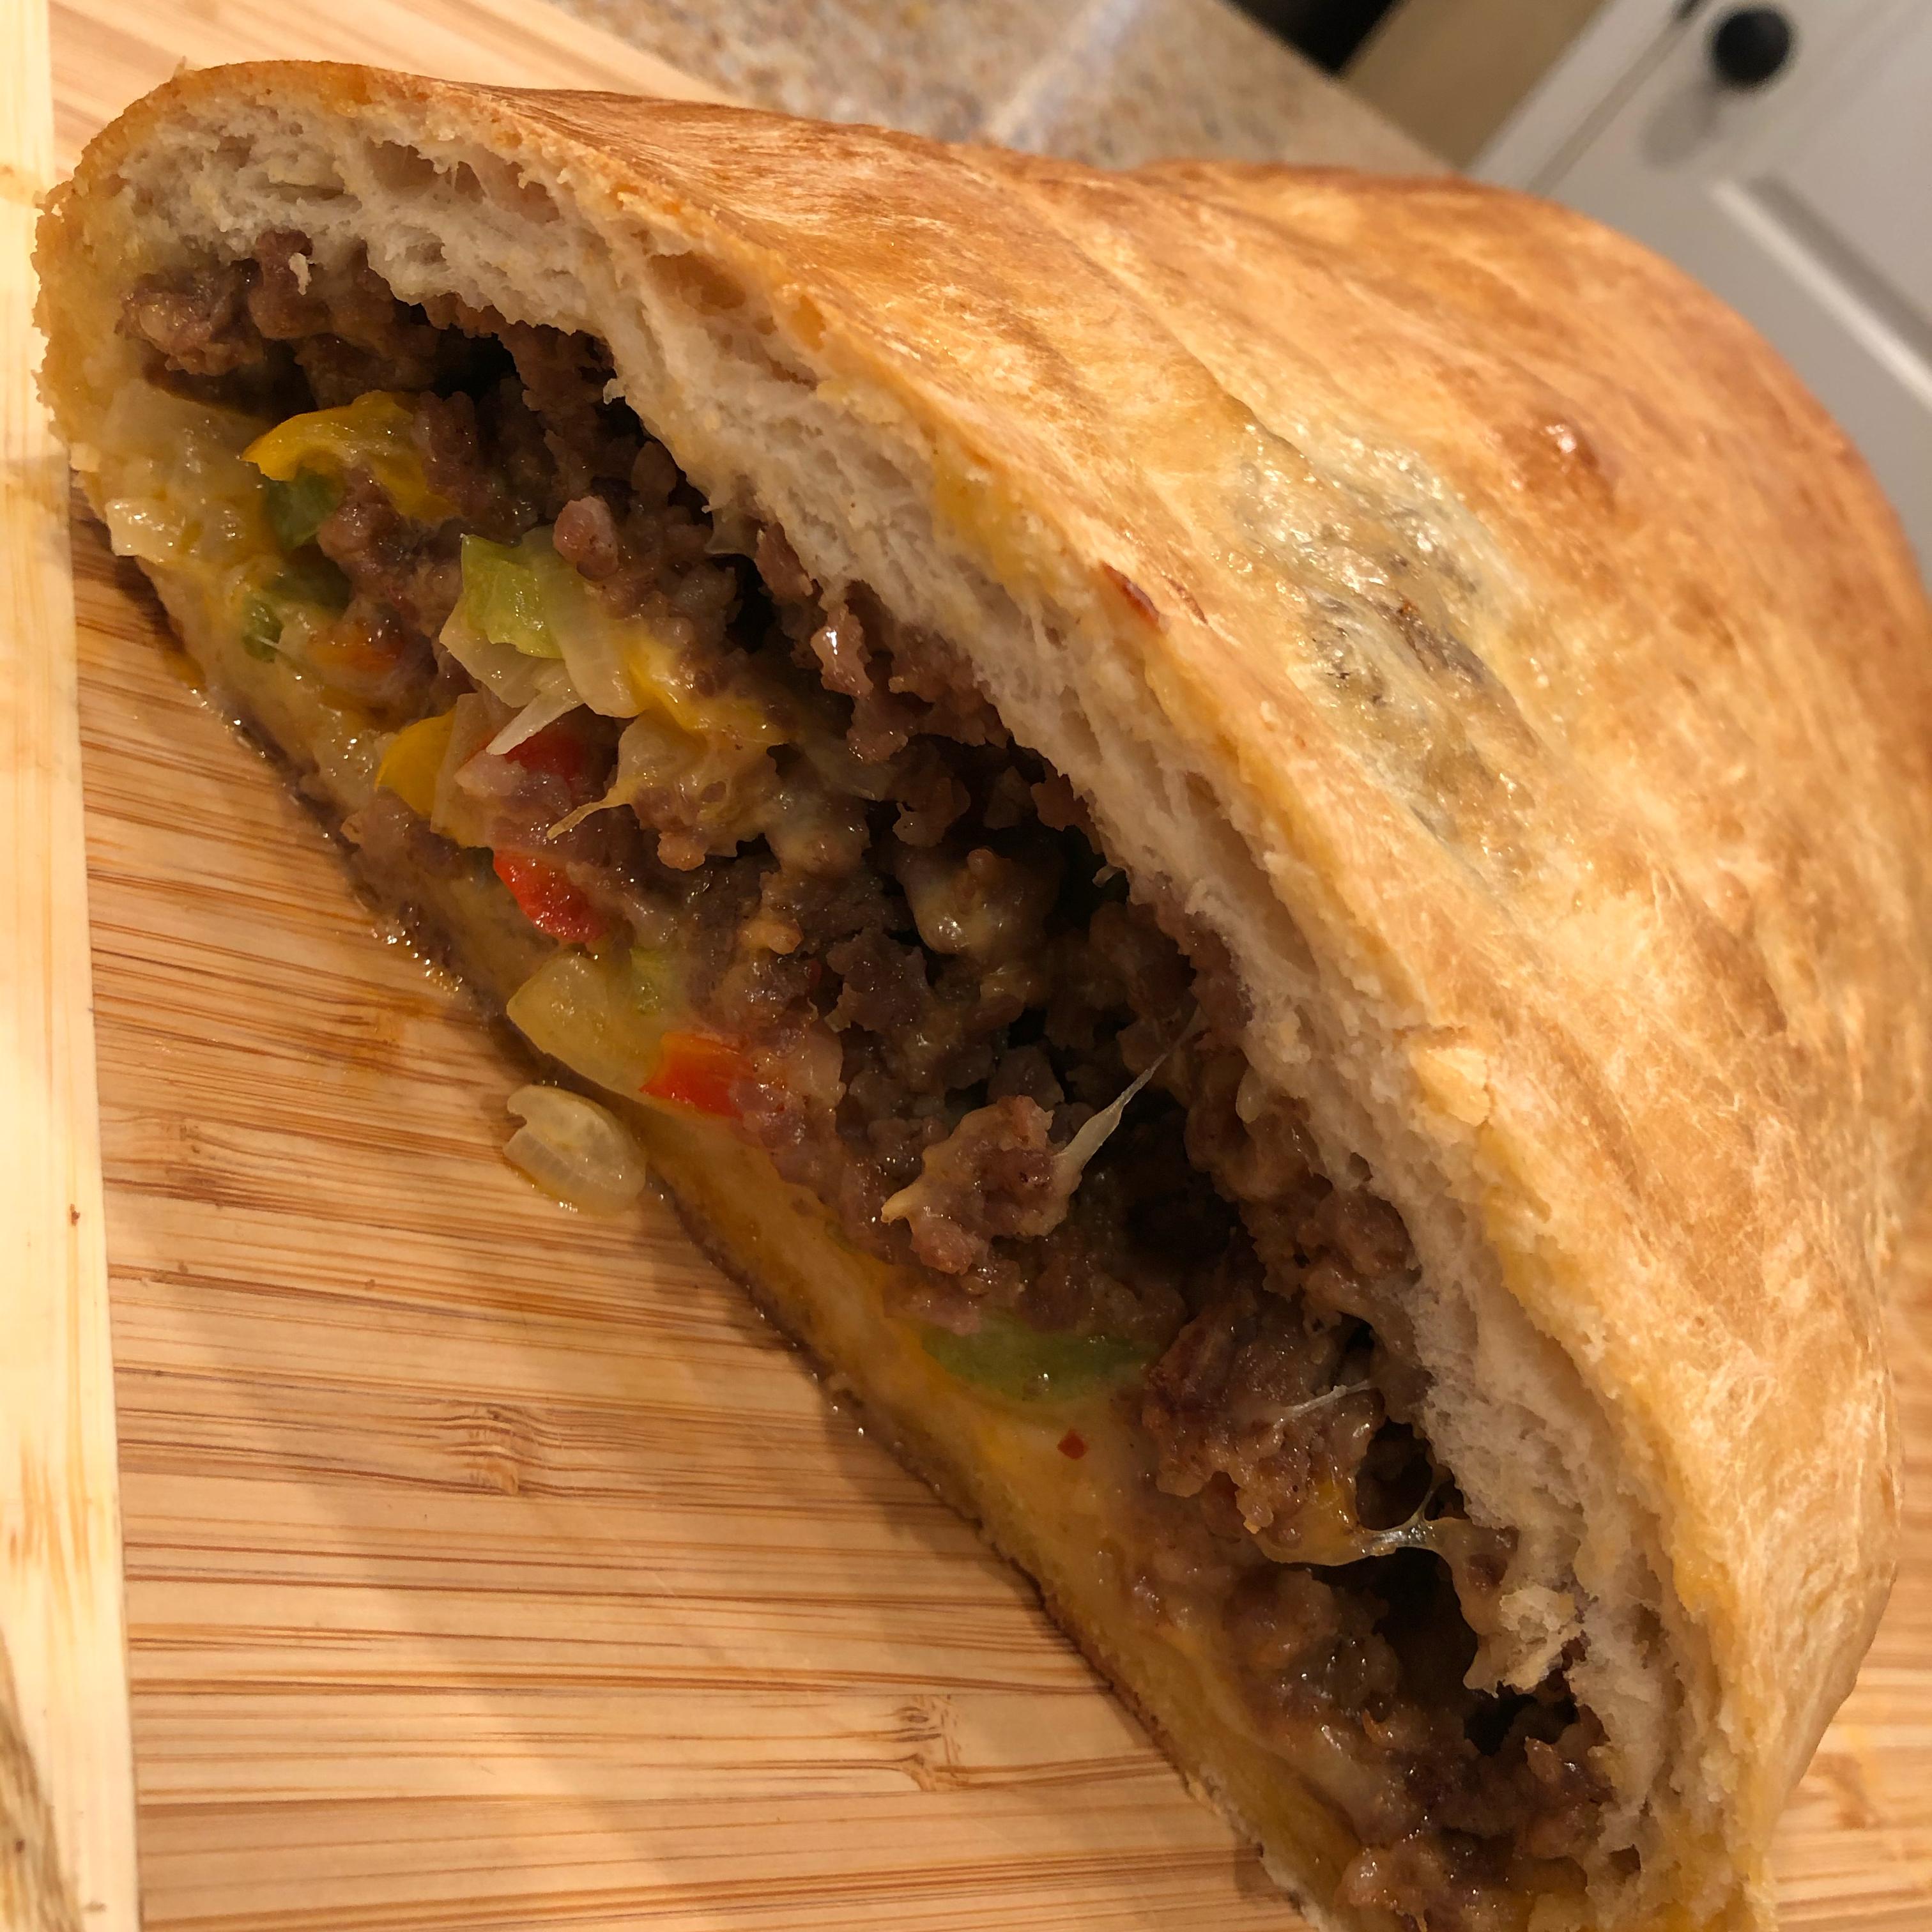 Breakfast Sausage Roll anox84